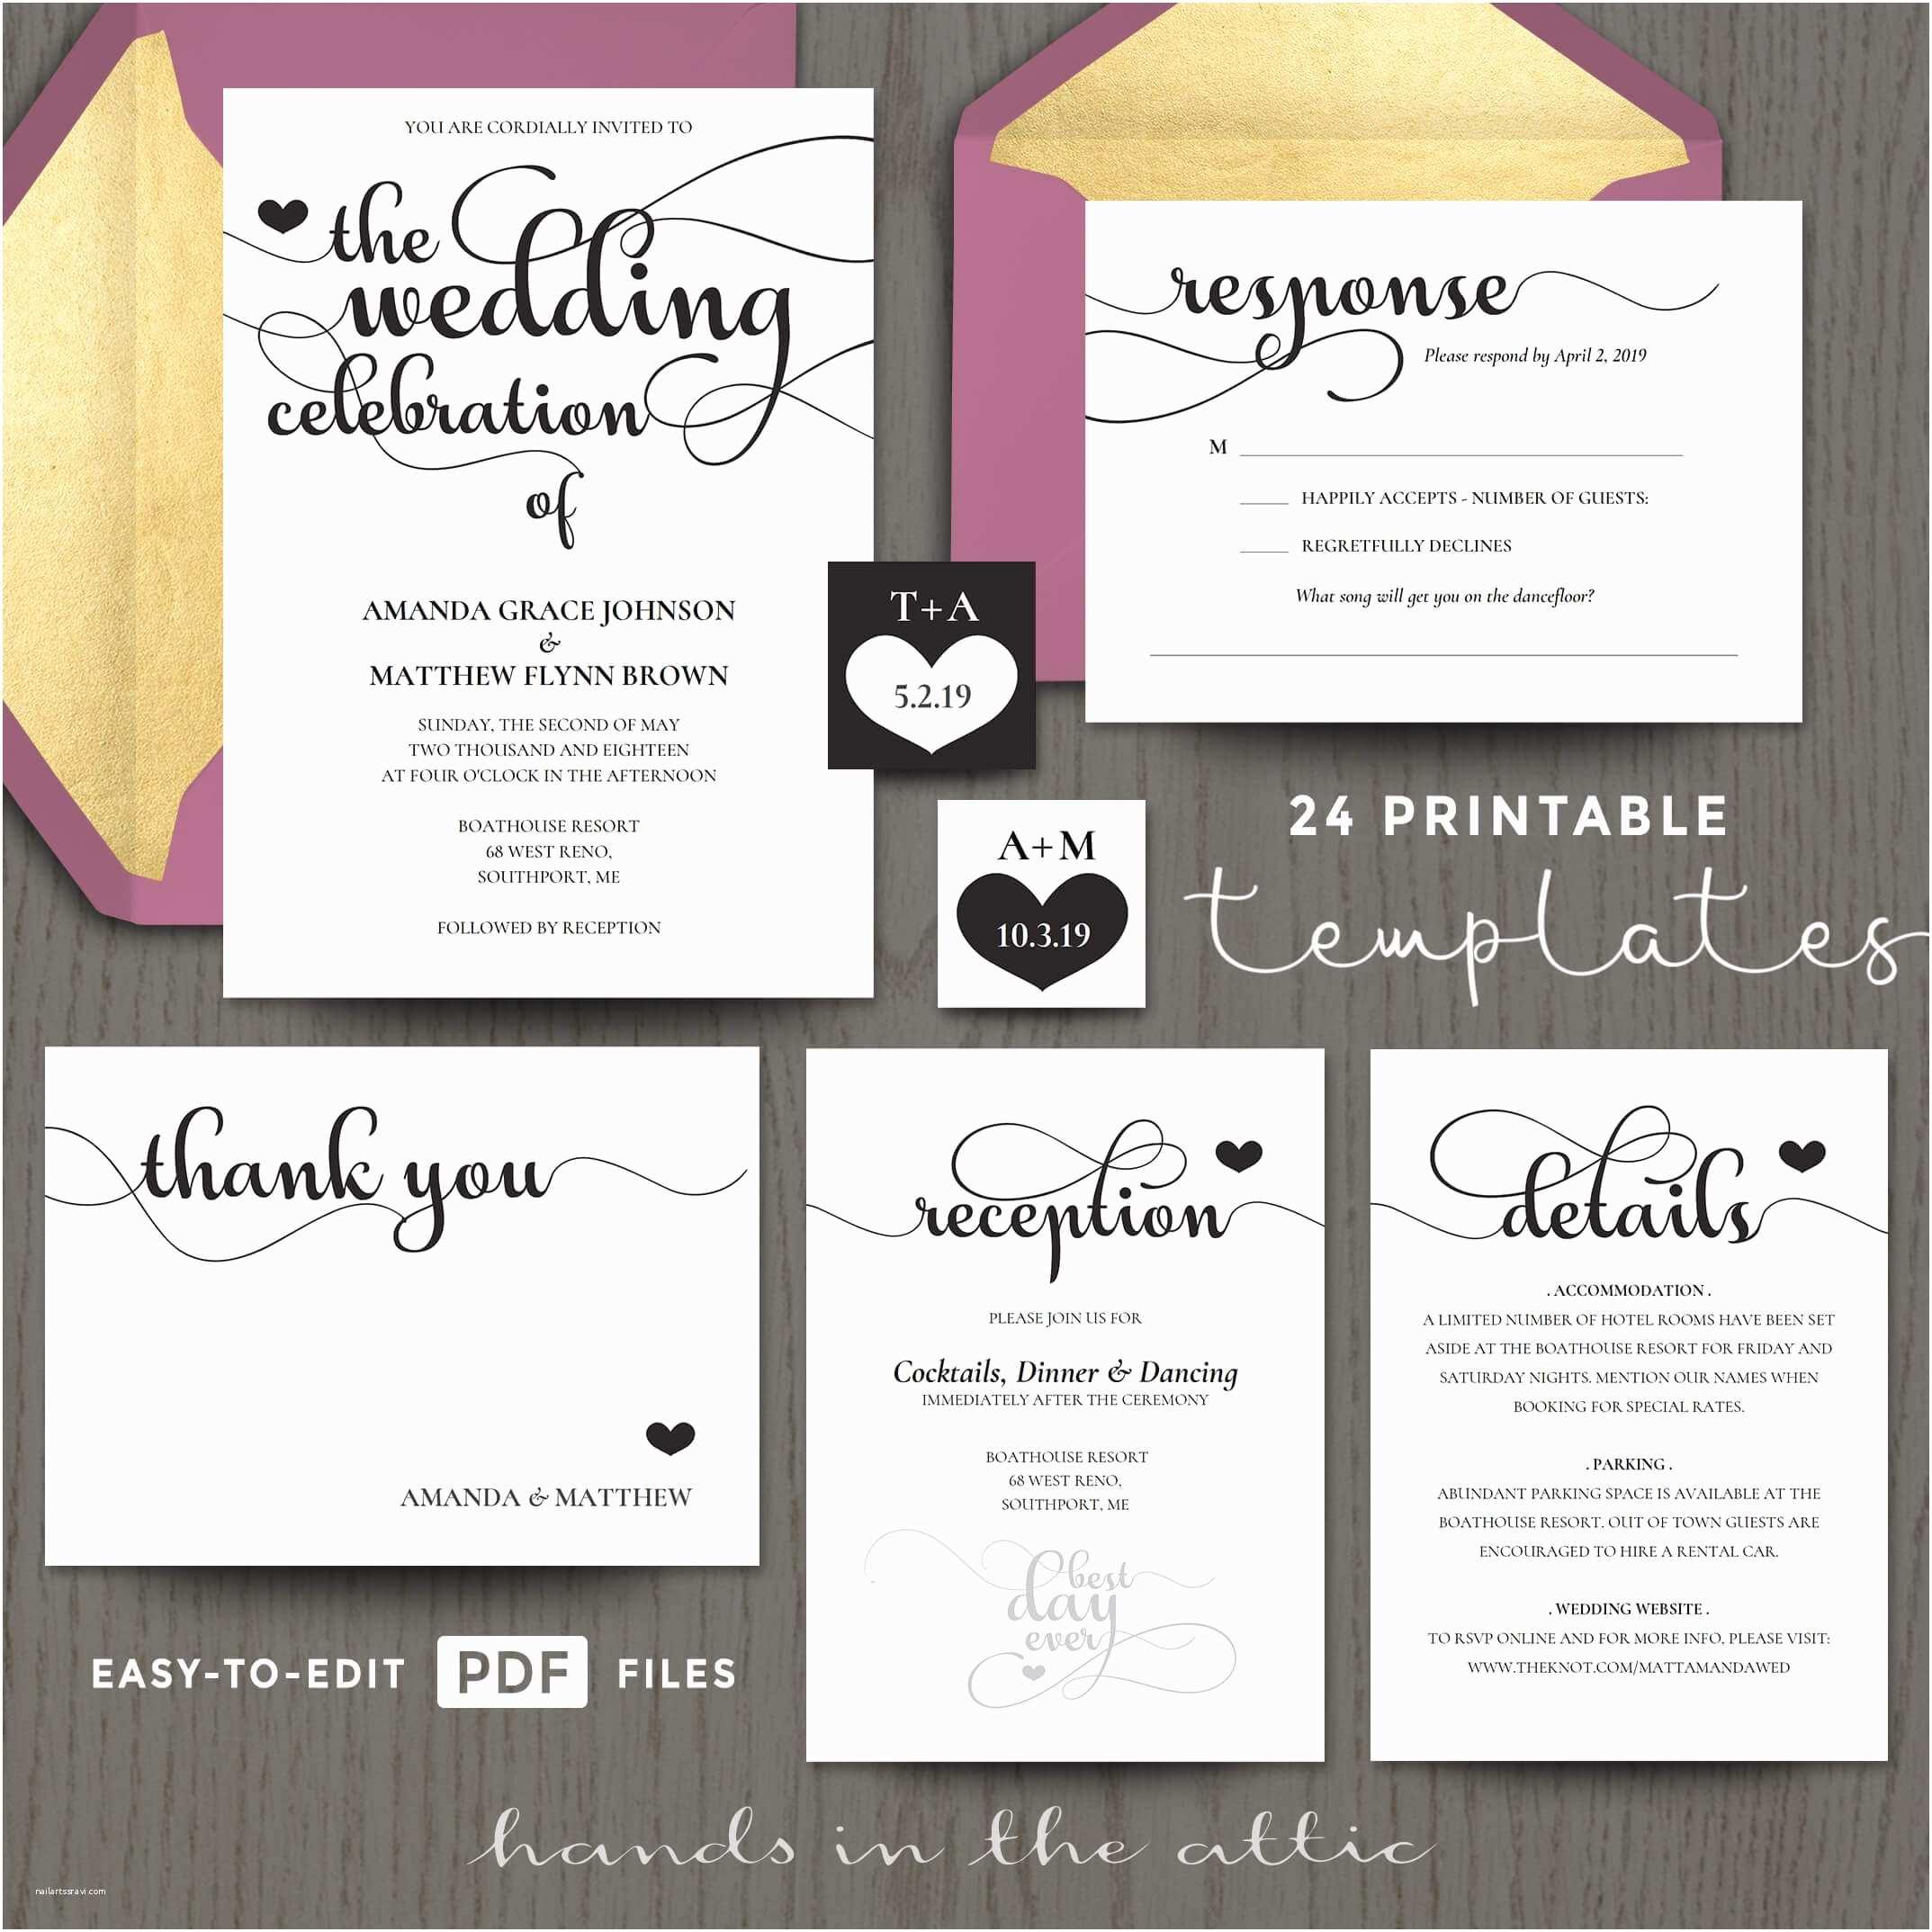 Wedding Celebration Invitations Wedding Celebration Invitation Templates